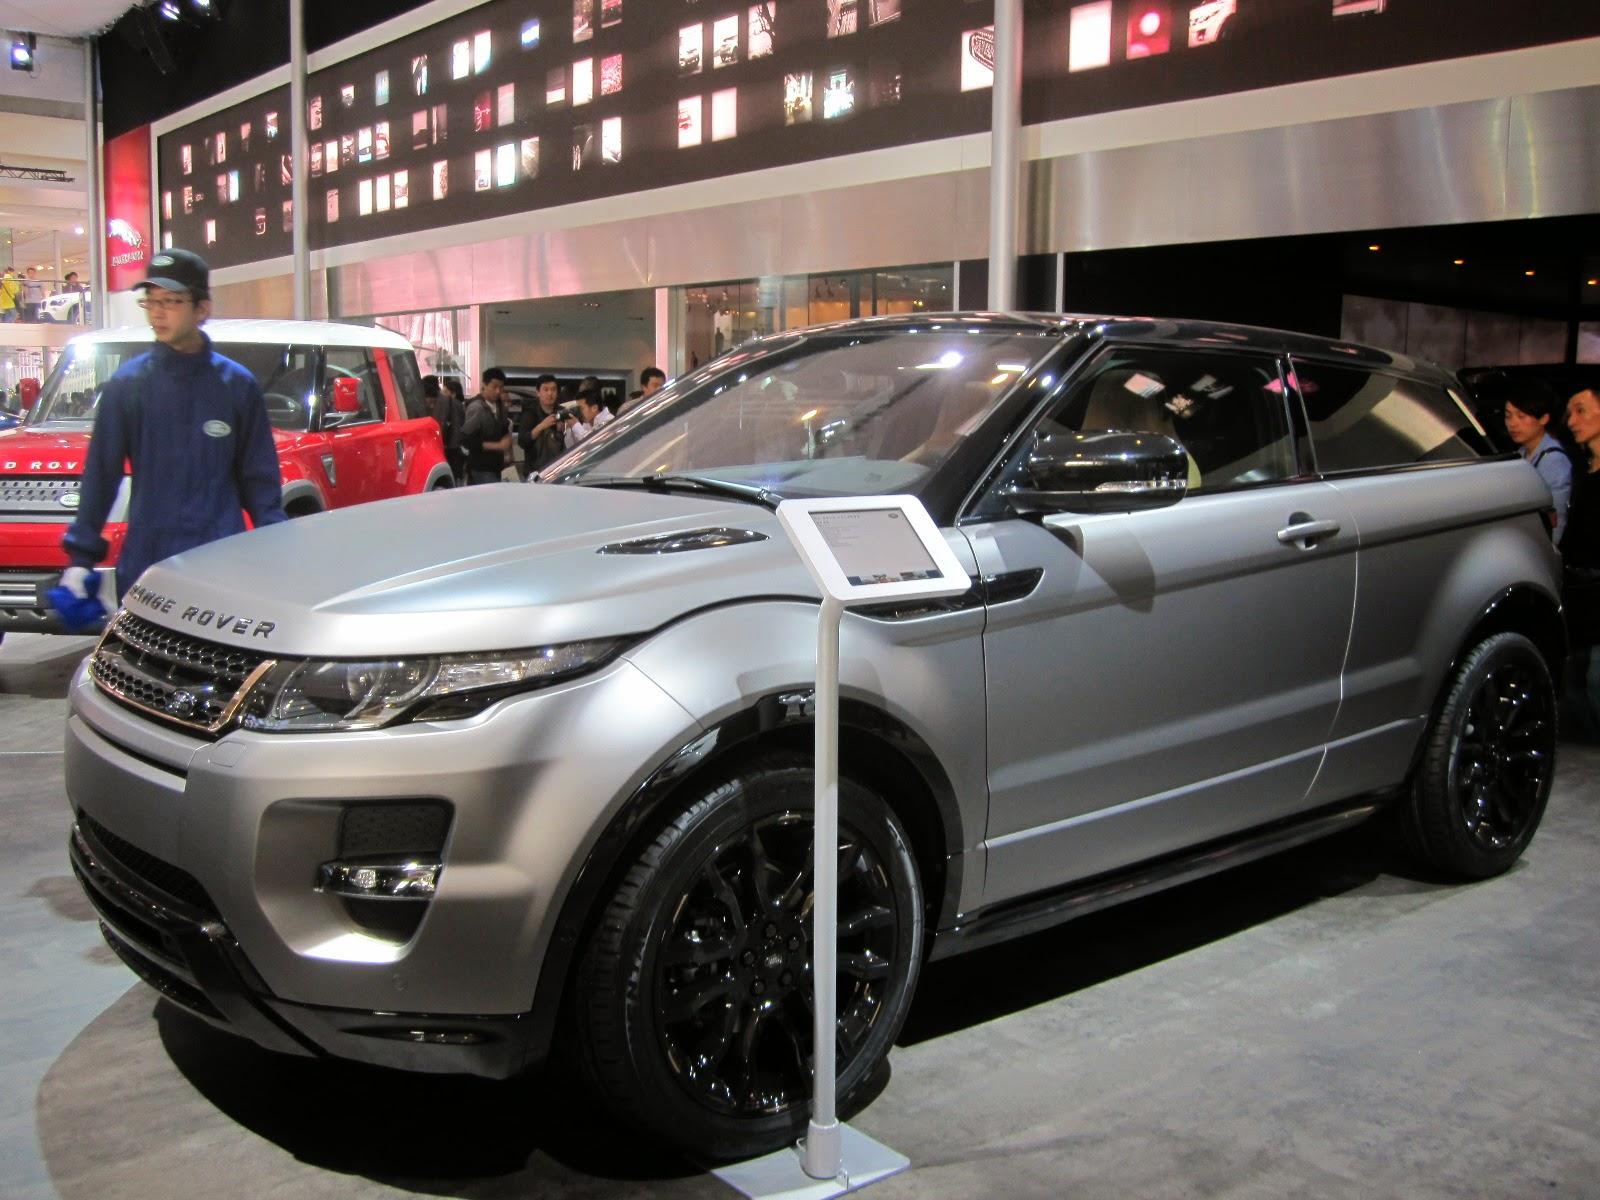 http://1.bp.blogspot.com/-rxKvM0gAYdU/U8eLEHhGxsI/AAAAAAAAJZY/FXkq0bHbUO4/s1600/2012_Auto_China_Jaguar_Land_Rover_Range_Rover_Evoque_Special_Edition_with_Victoria_Beckham_beijing_IMG_2284.JPG